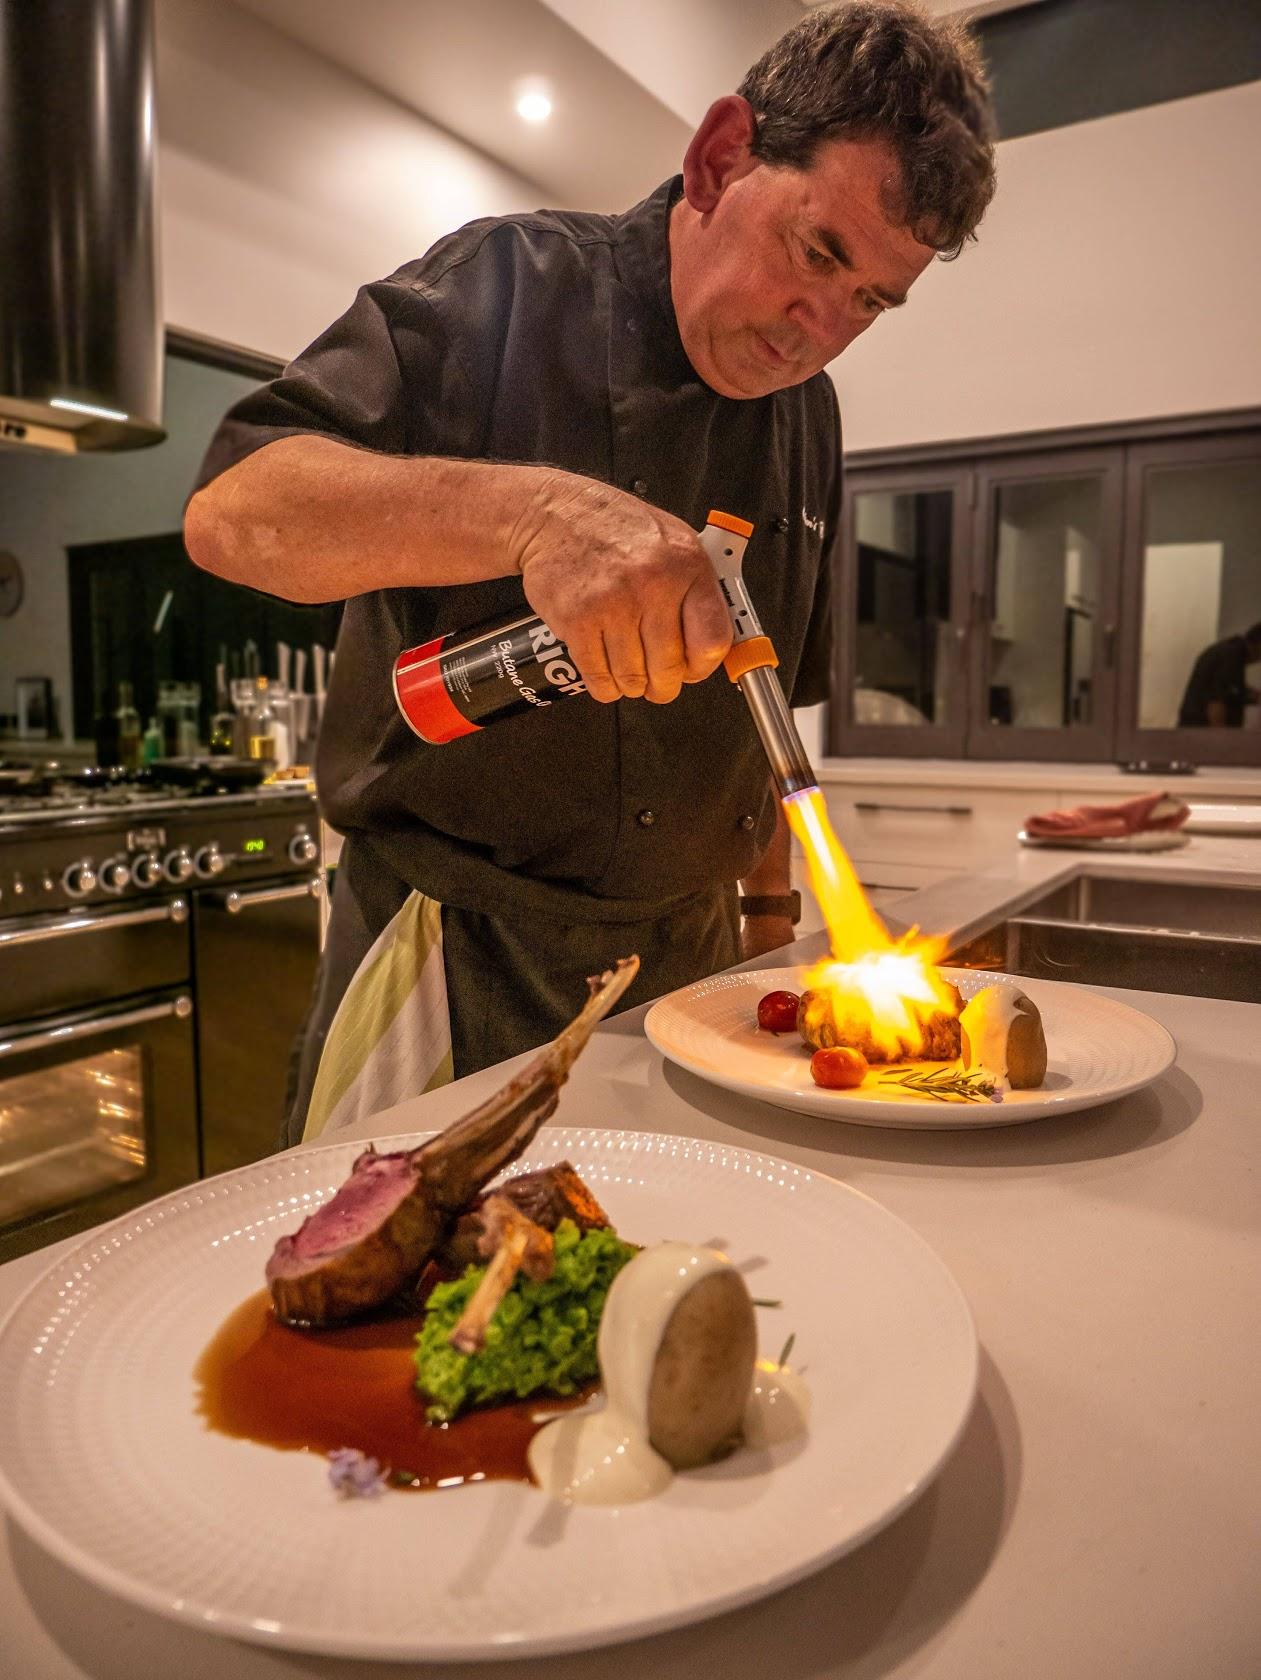 Enjoy an Amazing Steak from Olsen's Catering